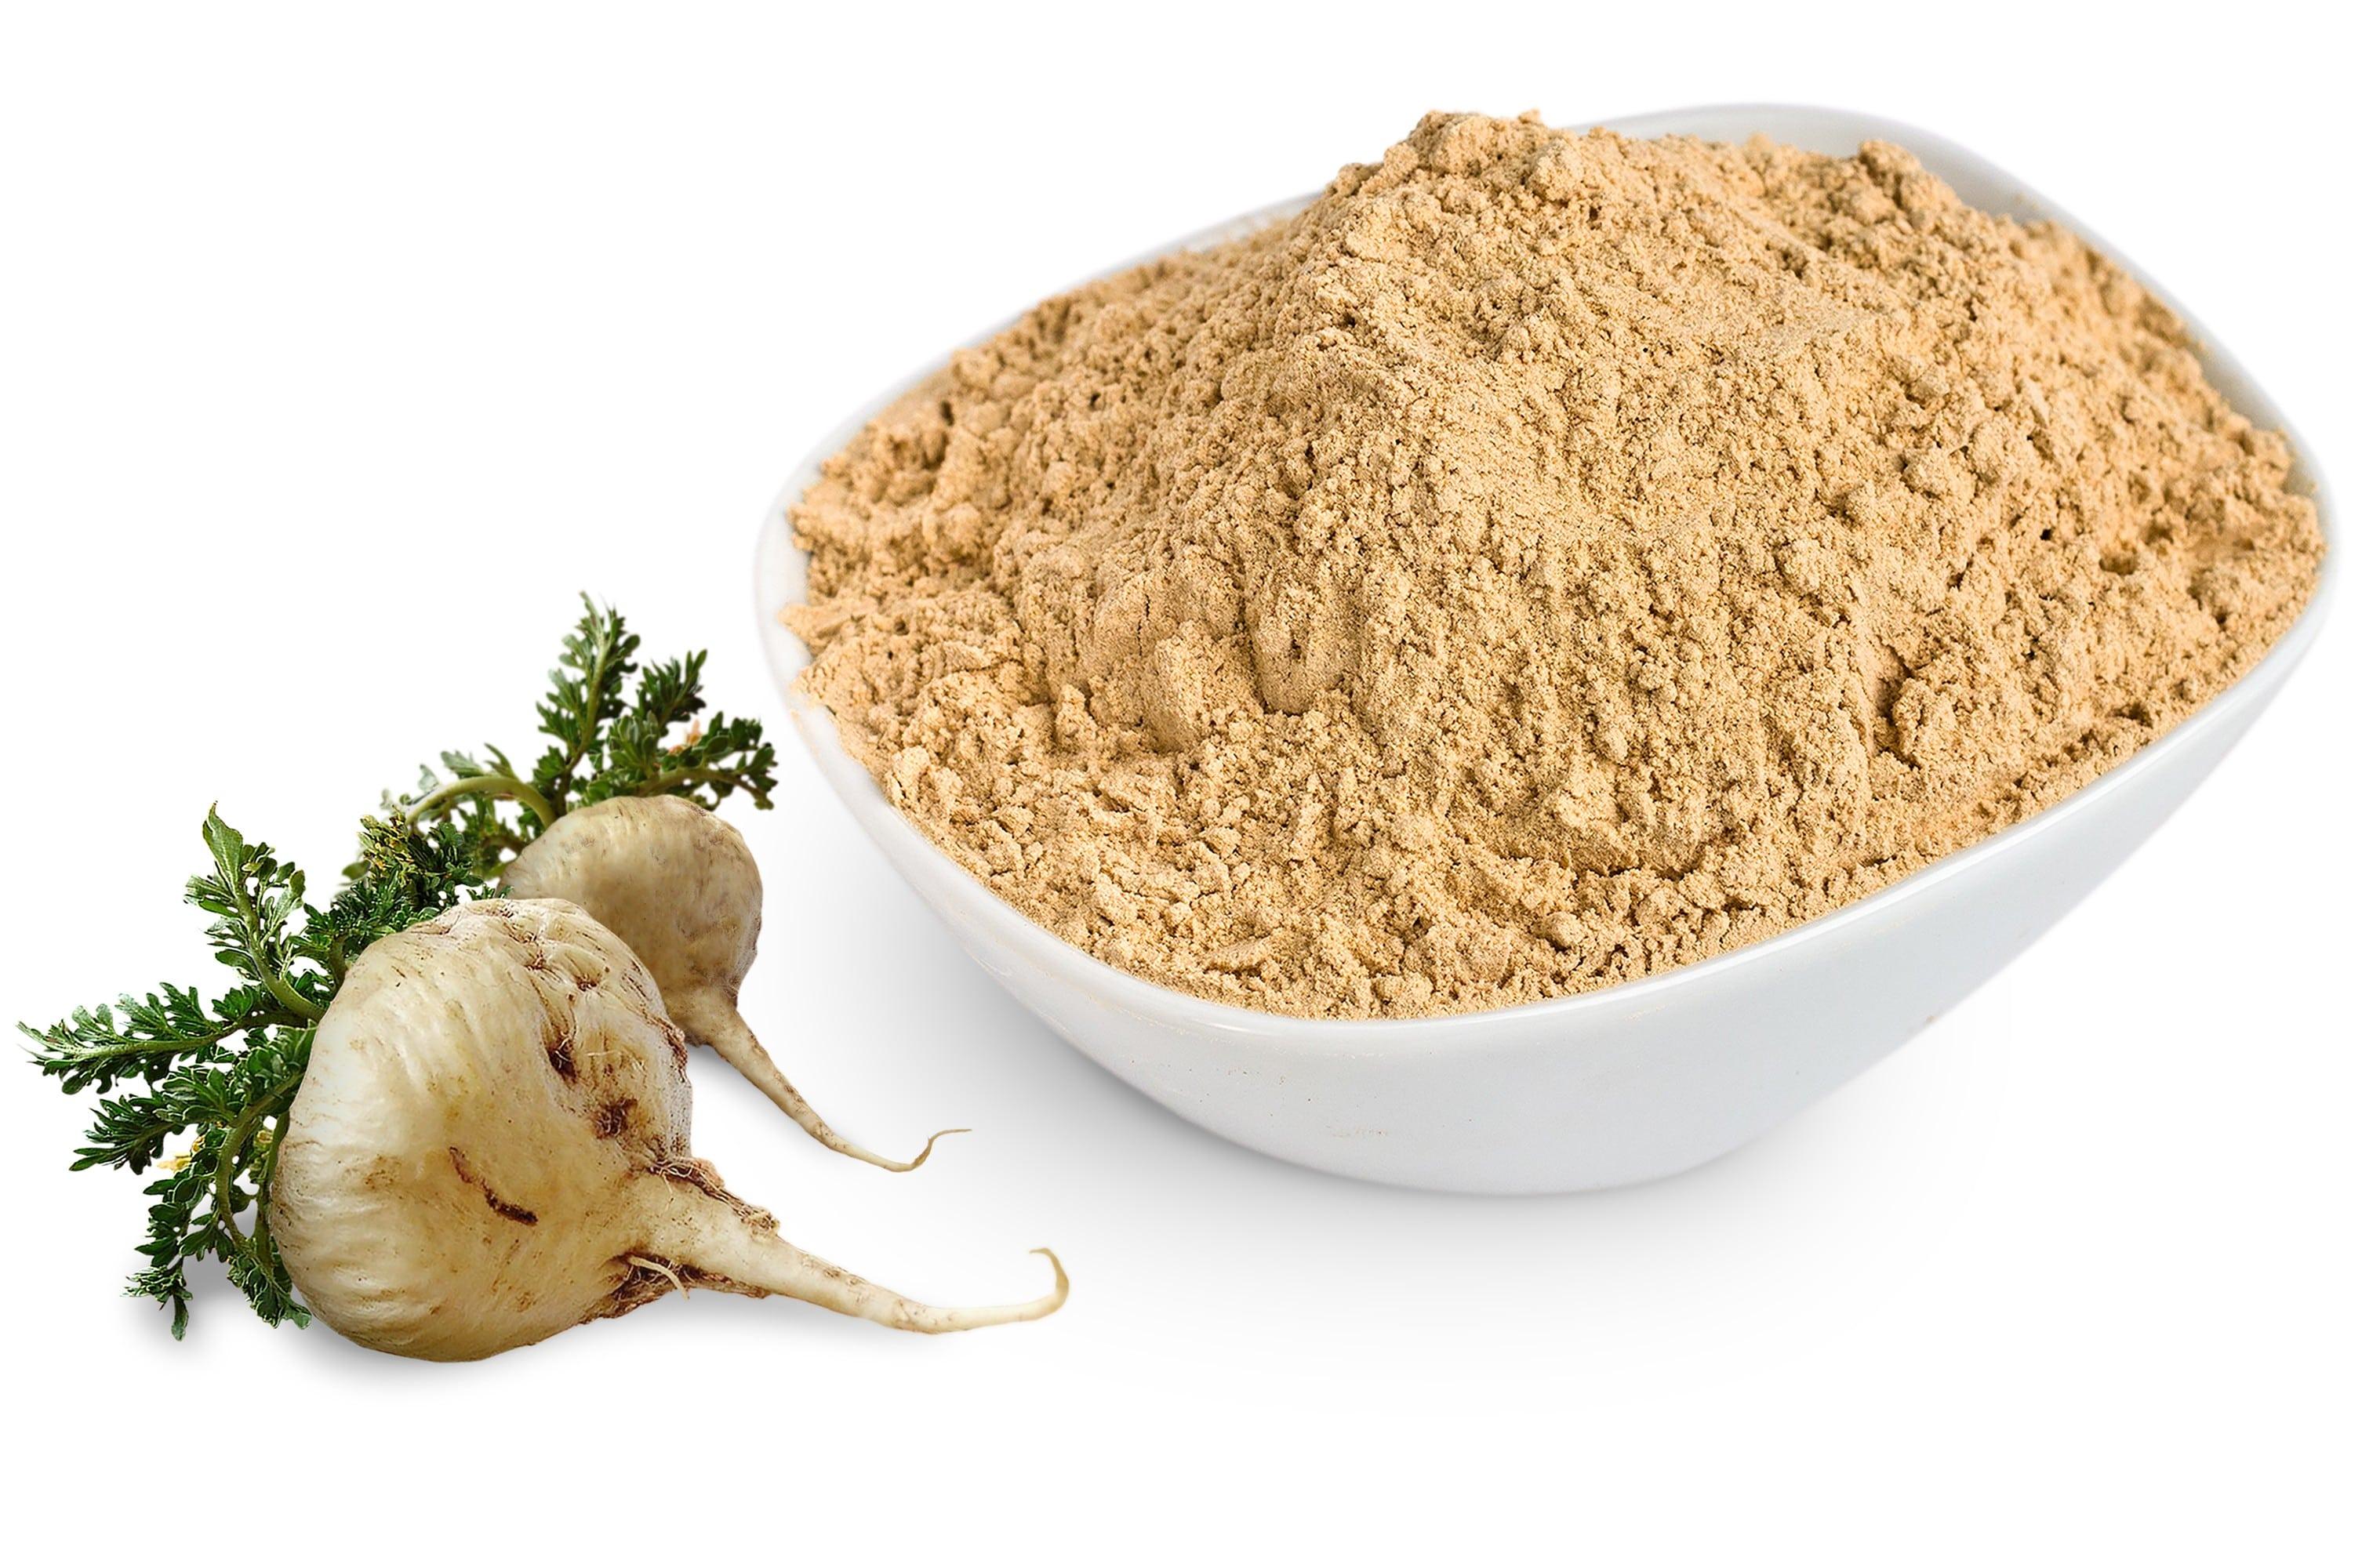 Yellow Maca Powder Andean Leaves 100 Peruvian Natural